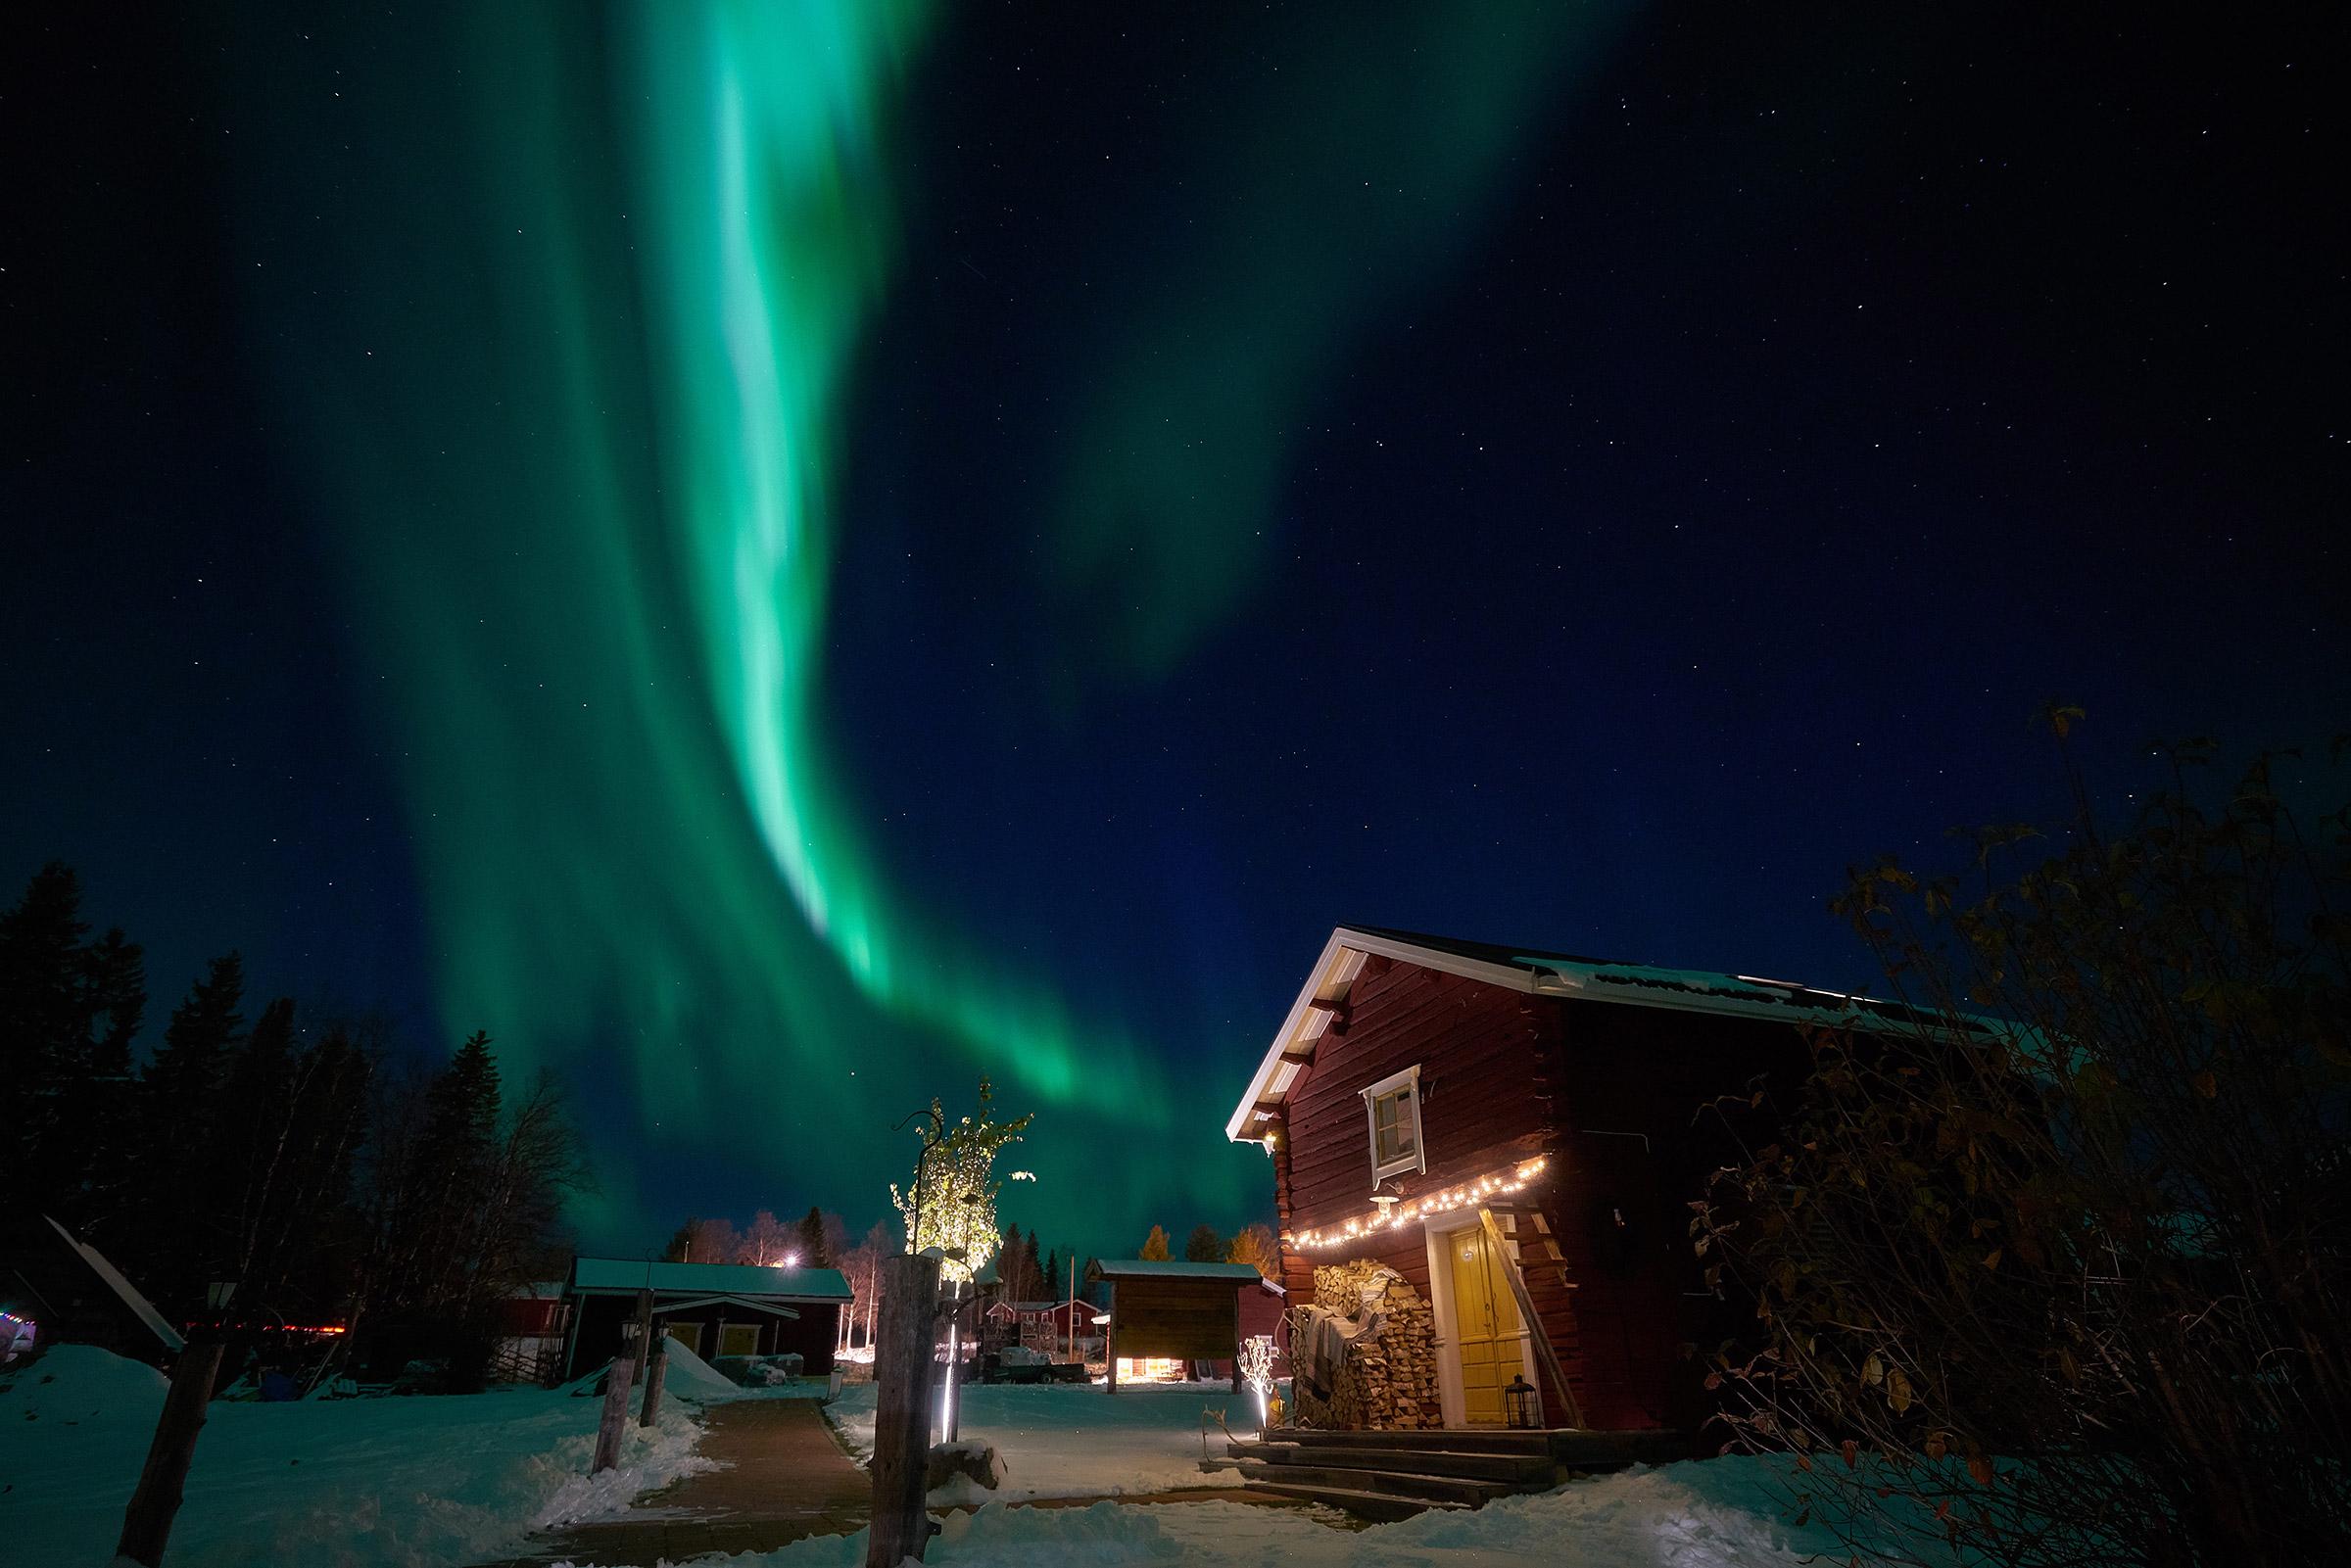 barn aurora borealis